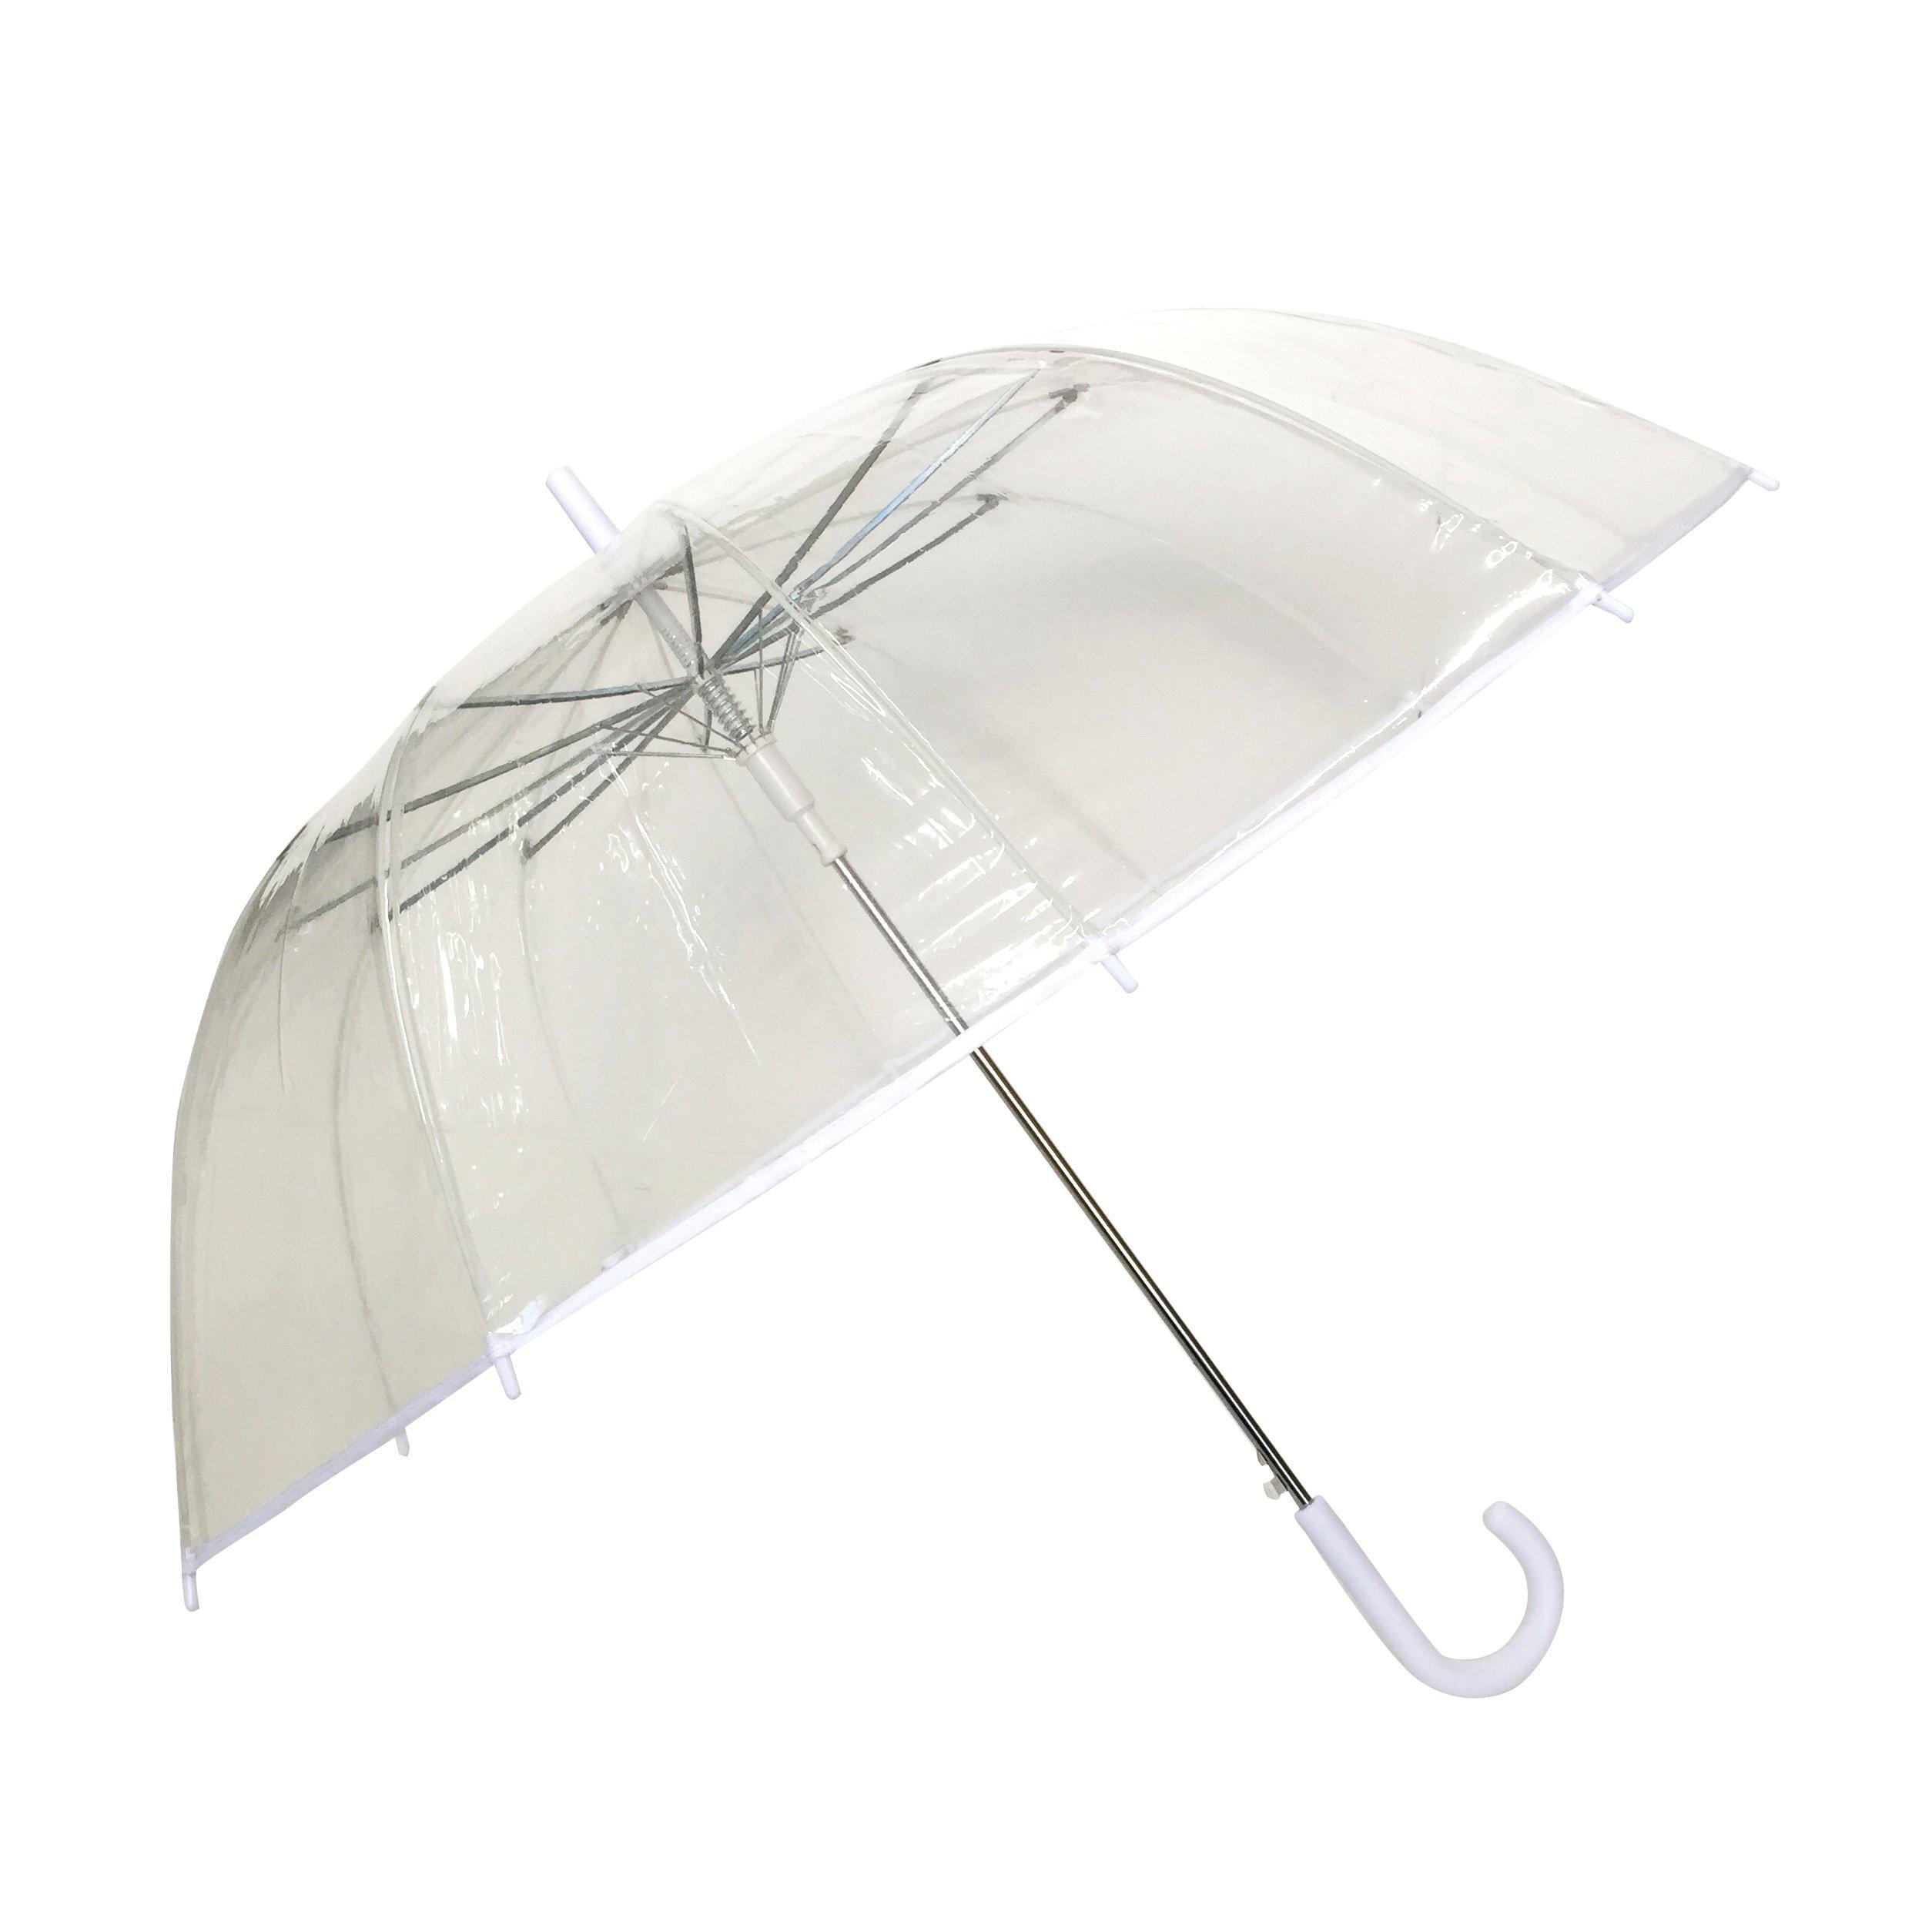 SMATI - Stick Umbrella - Clear Bubble Canopy - Big Size - 12 Fiberglass Ribs - Windproof - Auto Open - See Through (Transparent White)